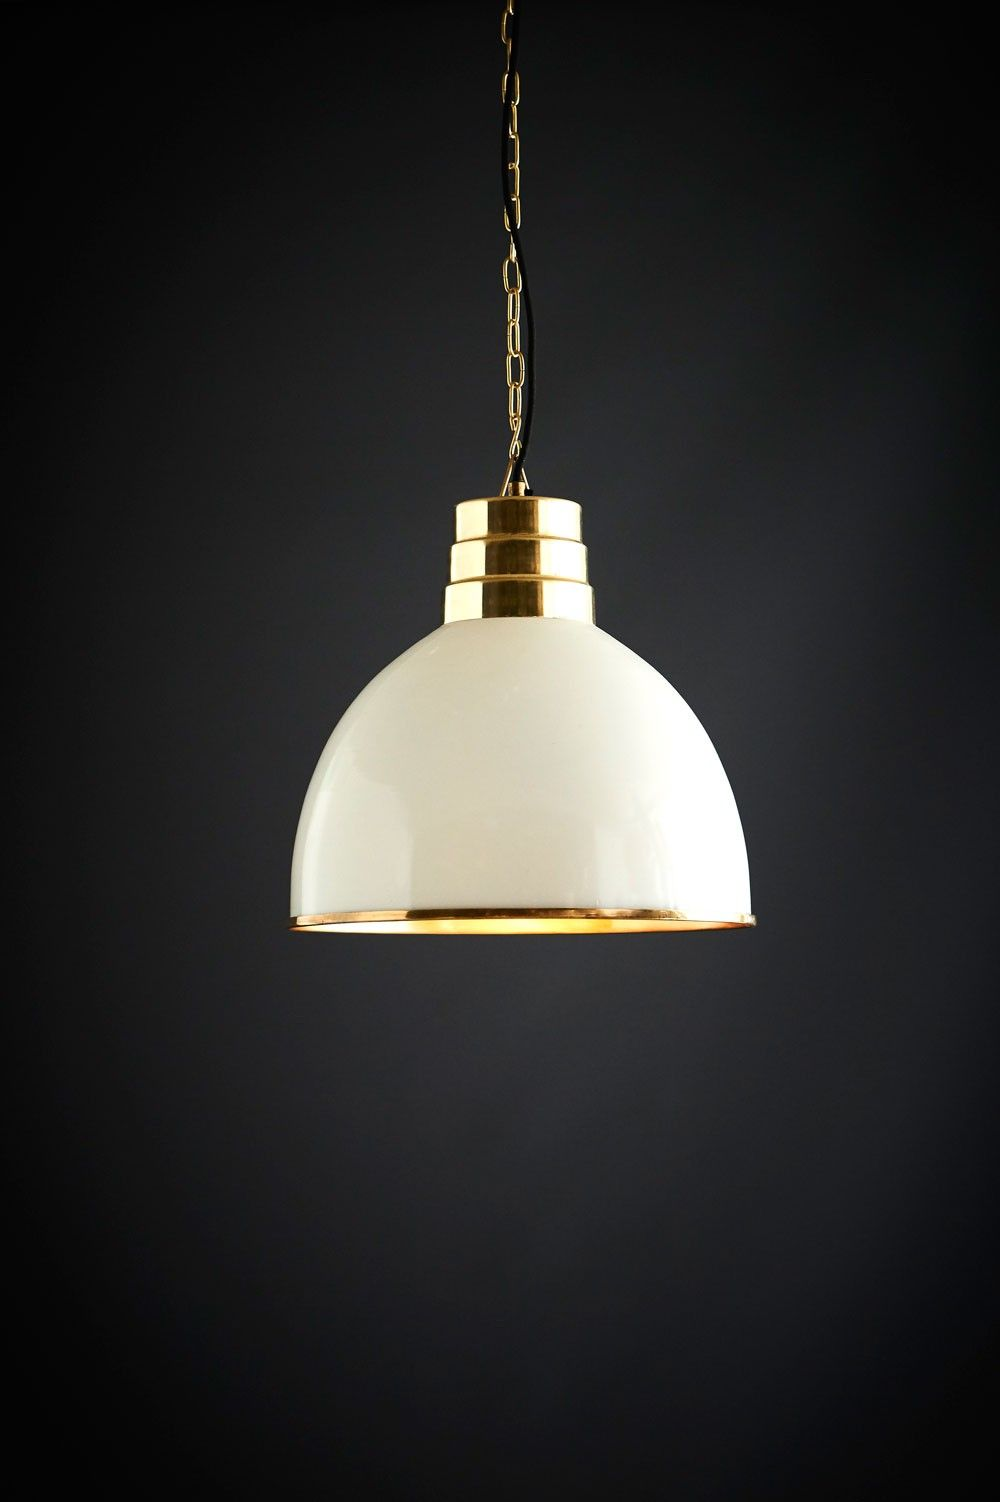 Ohio Pendant Light Ivory Dome Pendant Lighting Pendant Light